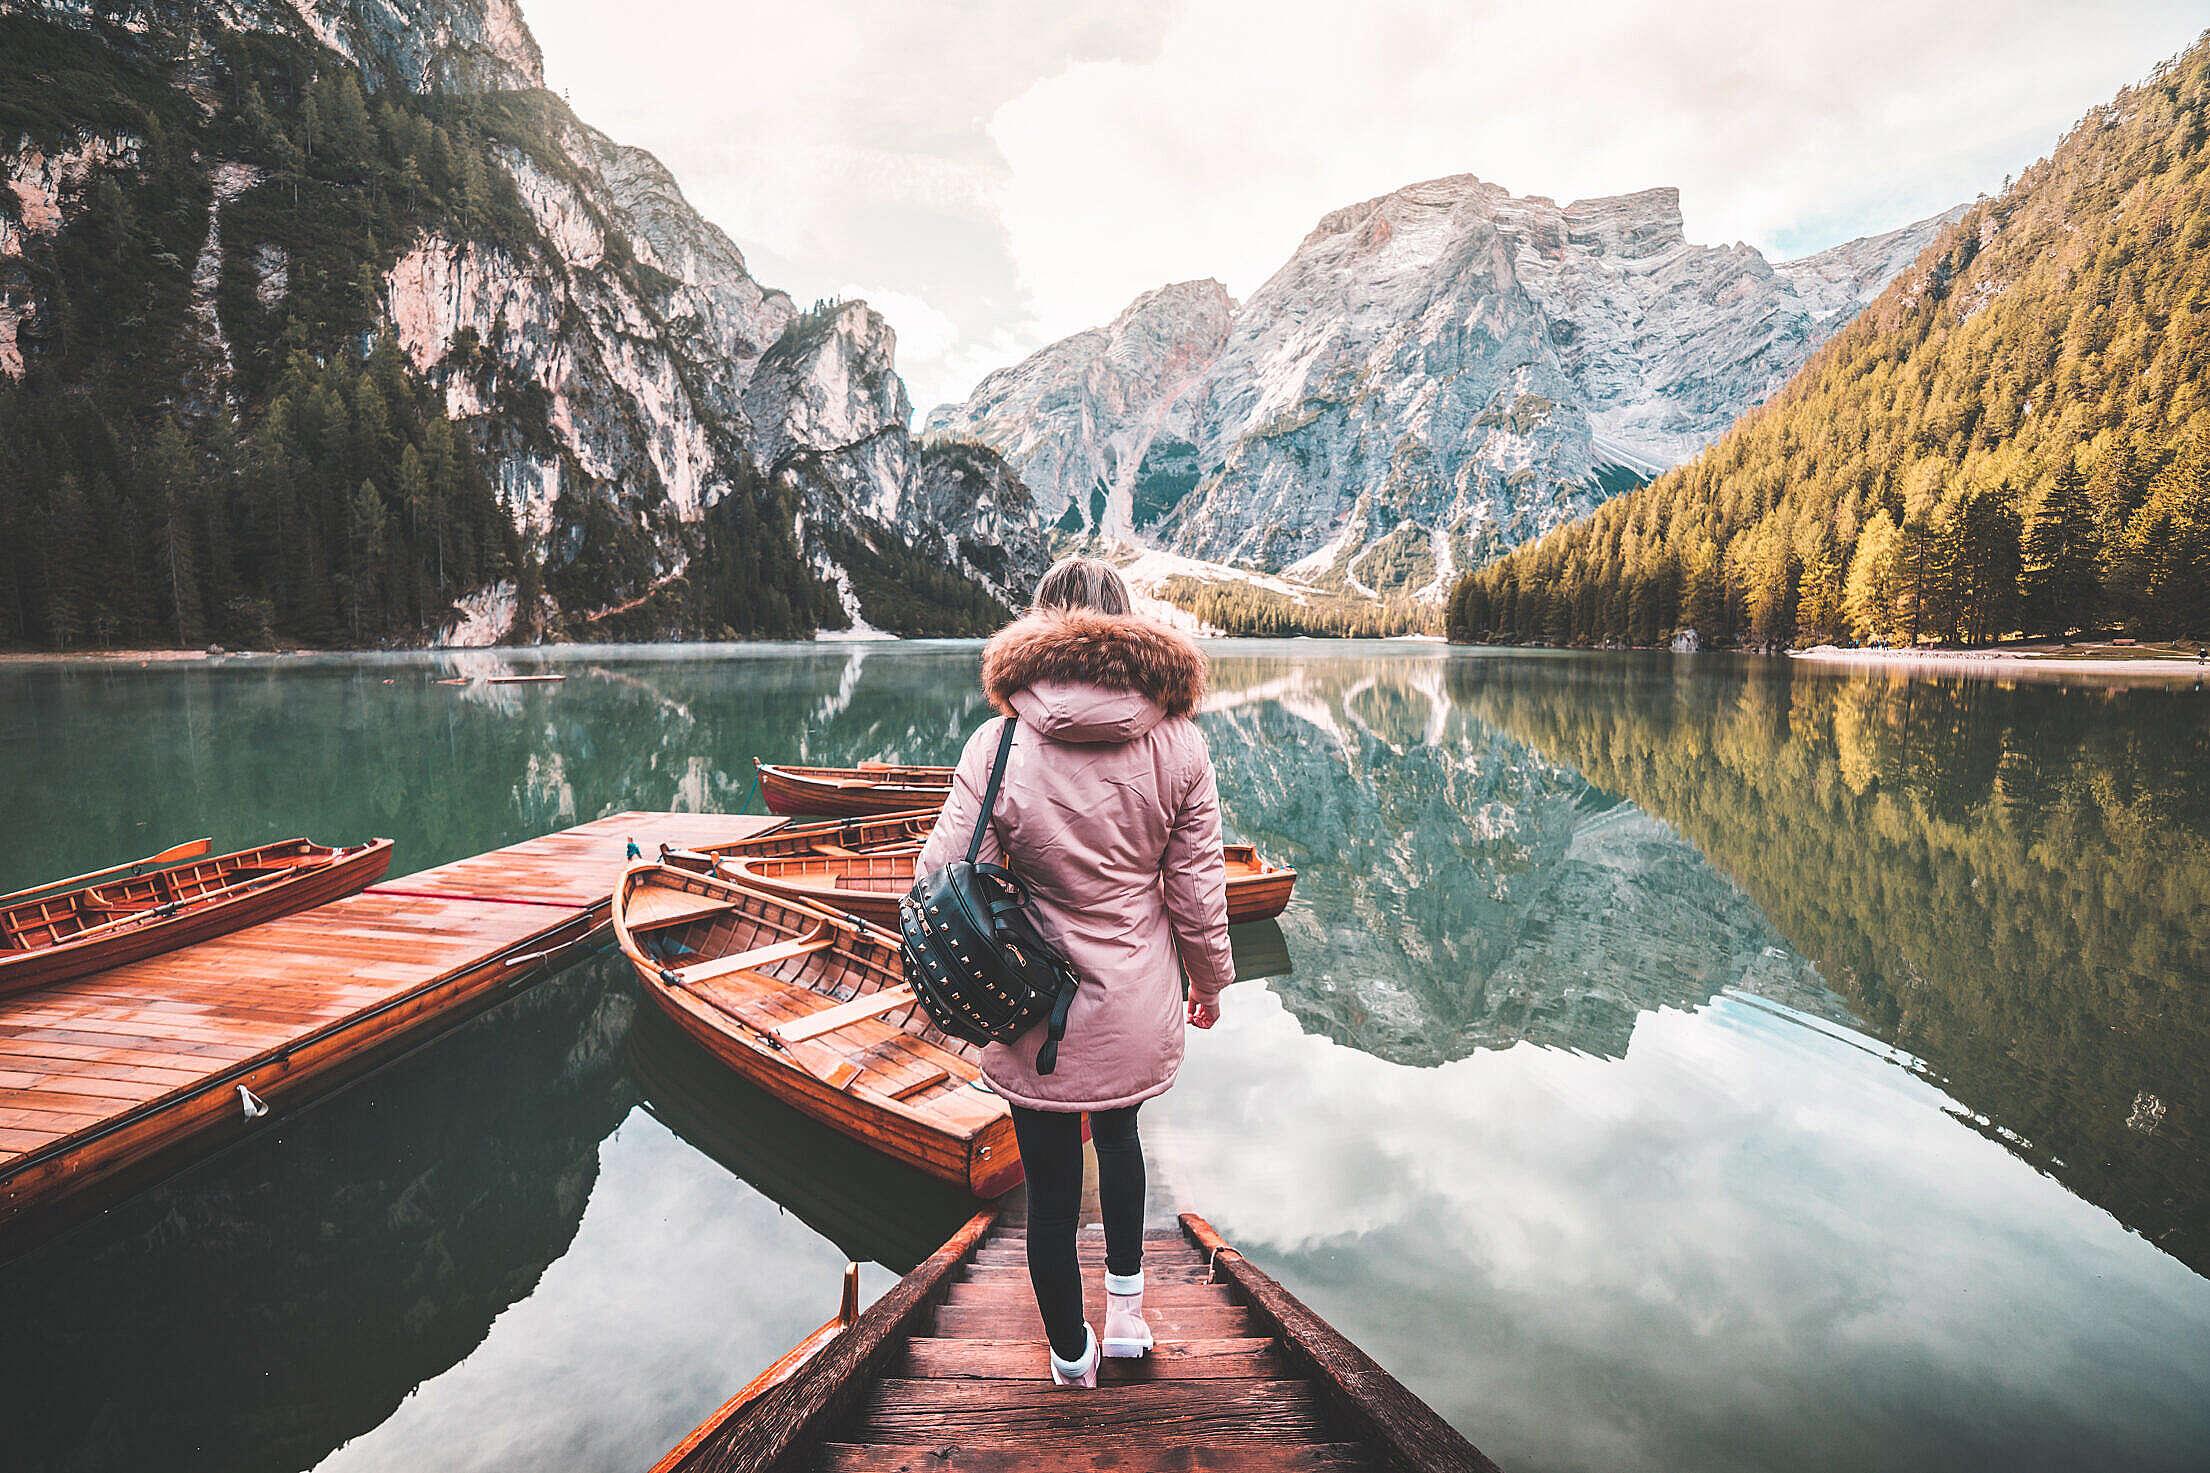 Young Woman Enjoying Beautiful Scenery of Lago di Braies, Italy Free Stock Photo